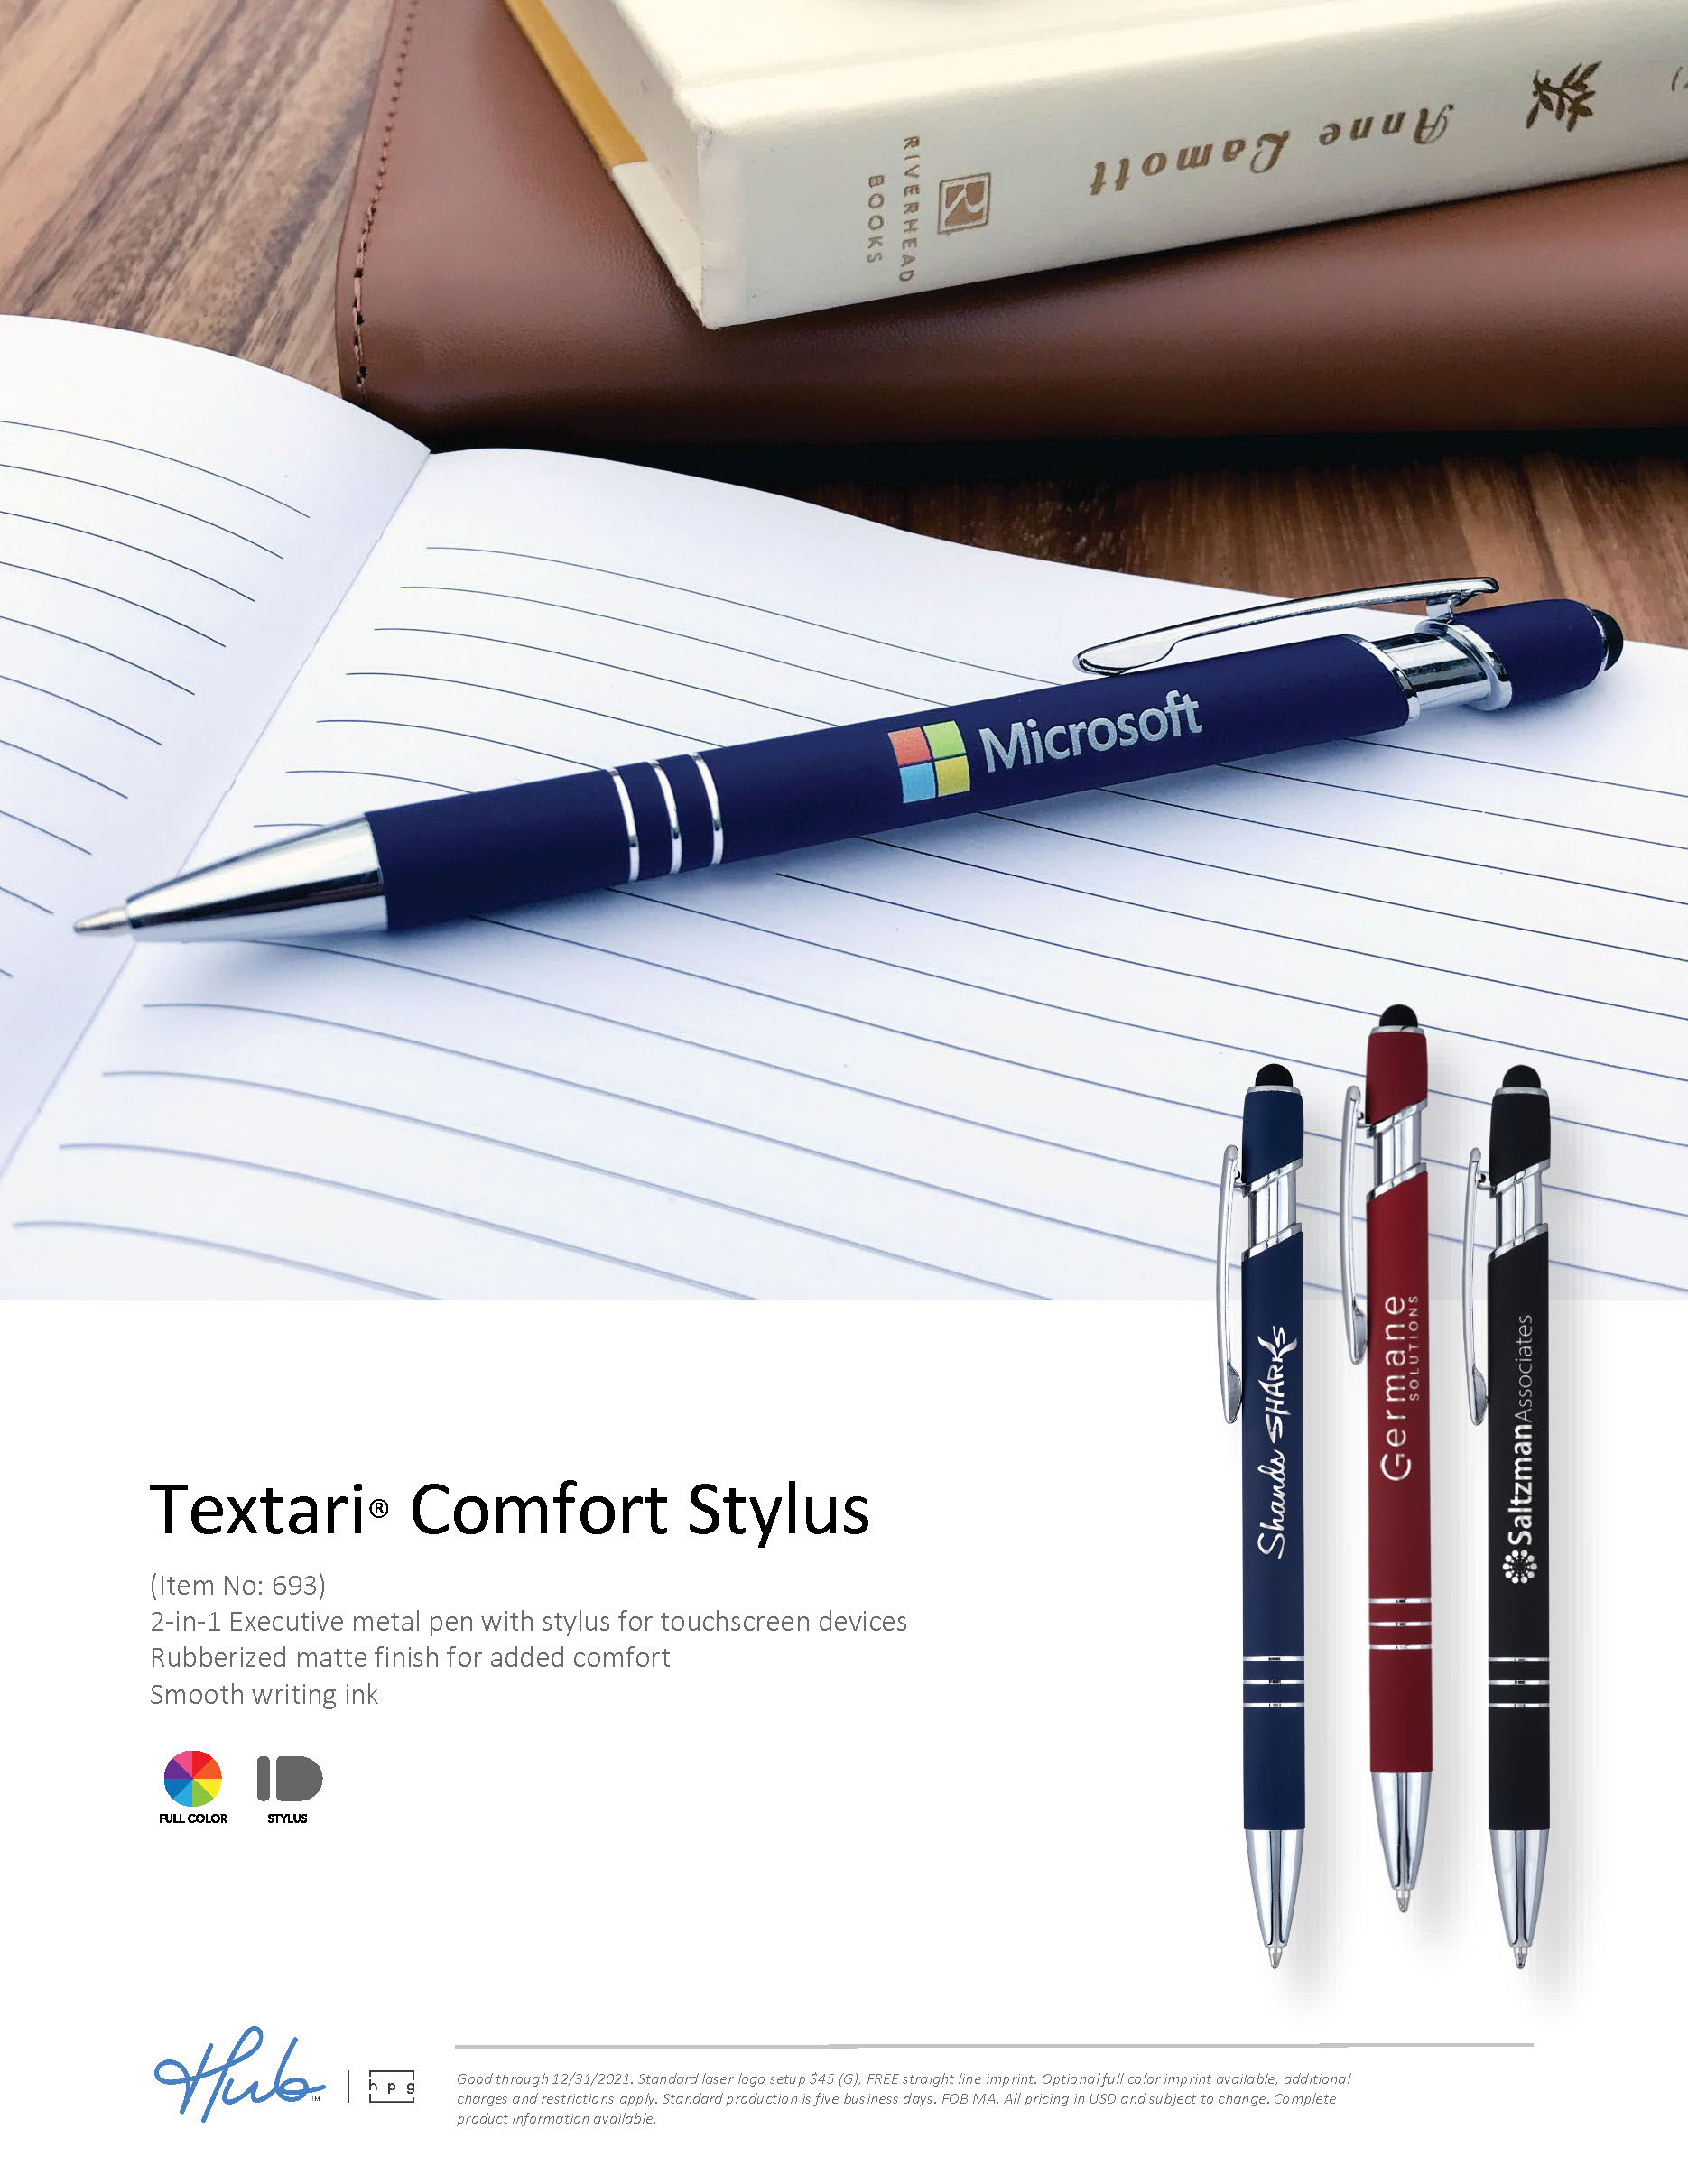 Textari Comfort Stylus pen flyer (Hub branded)